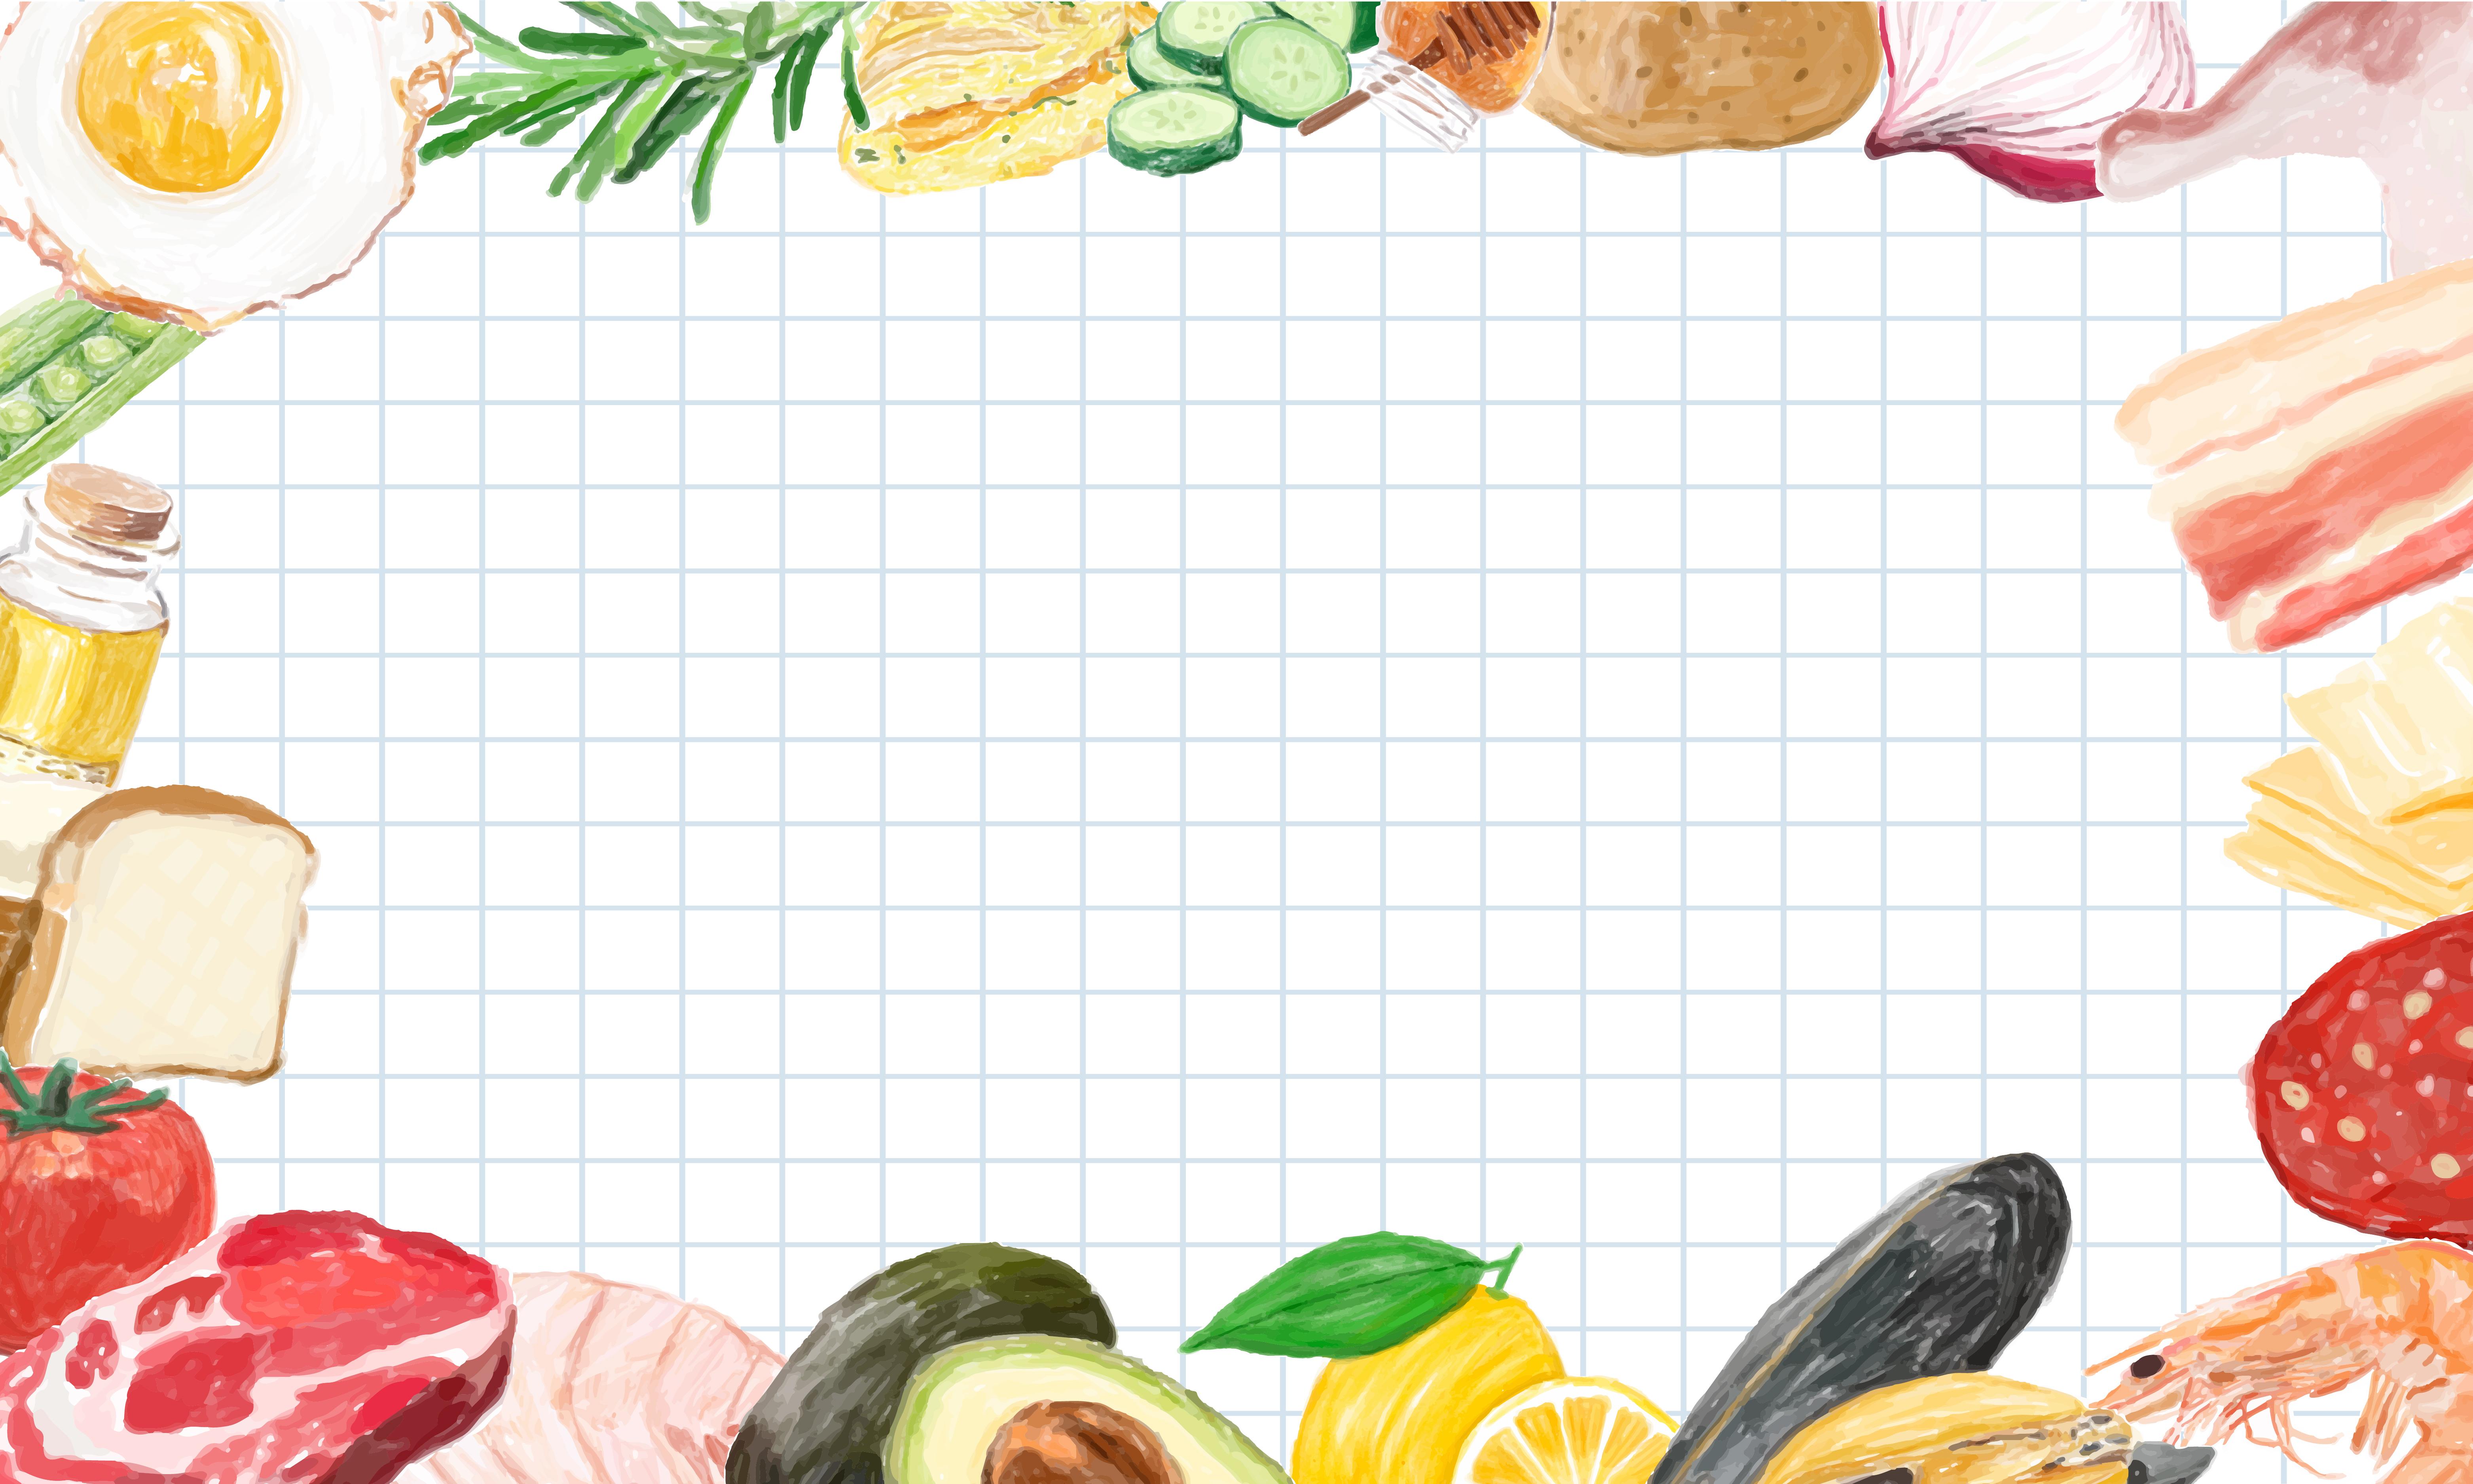 Food Frame Free Vector Art - (2,025 Free Downloads)